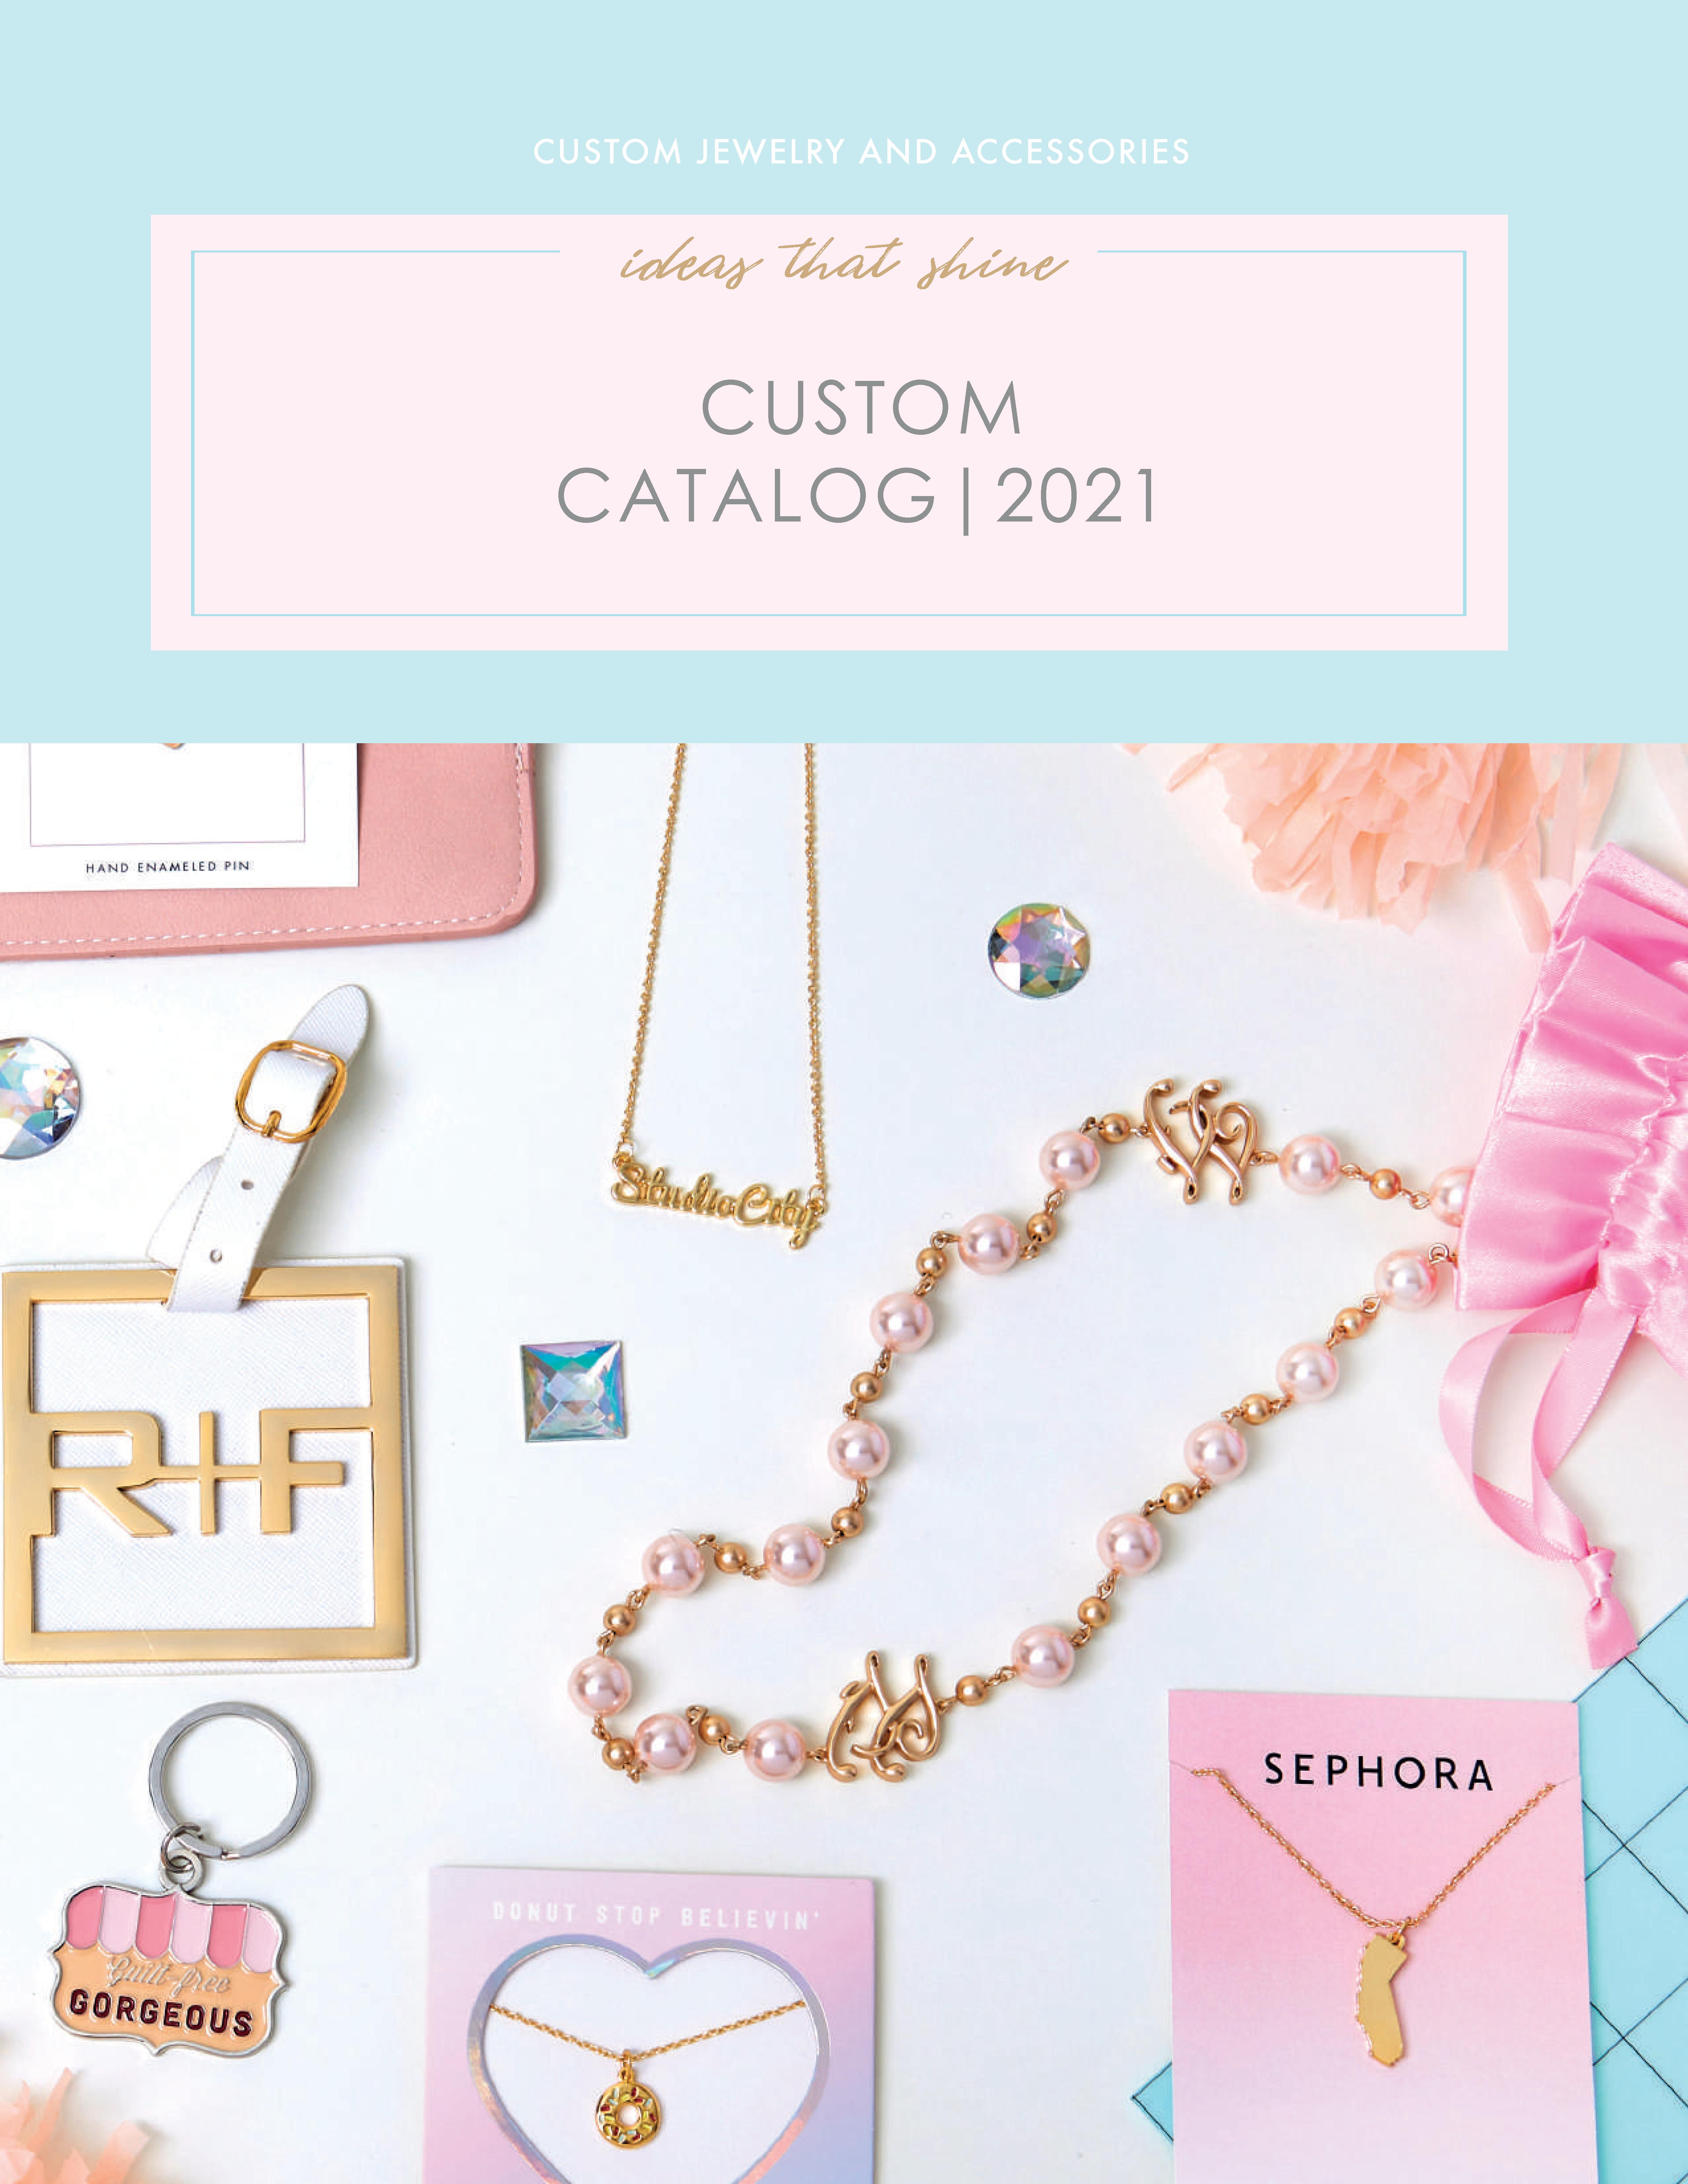 2019 Client Safe Version of Catalog